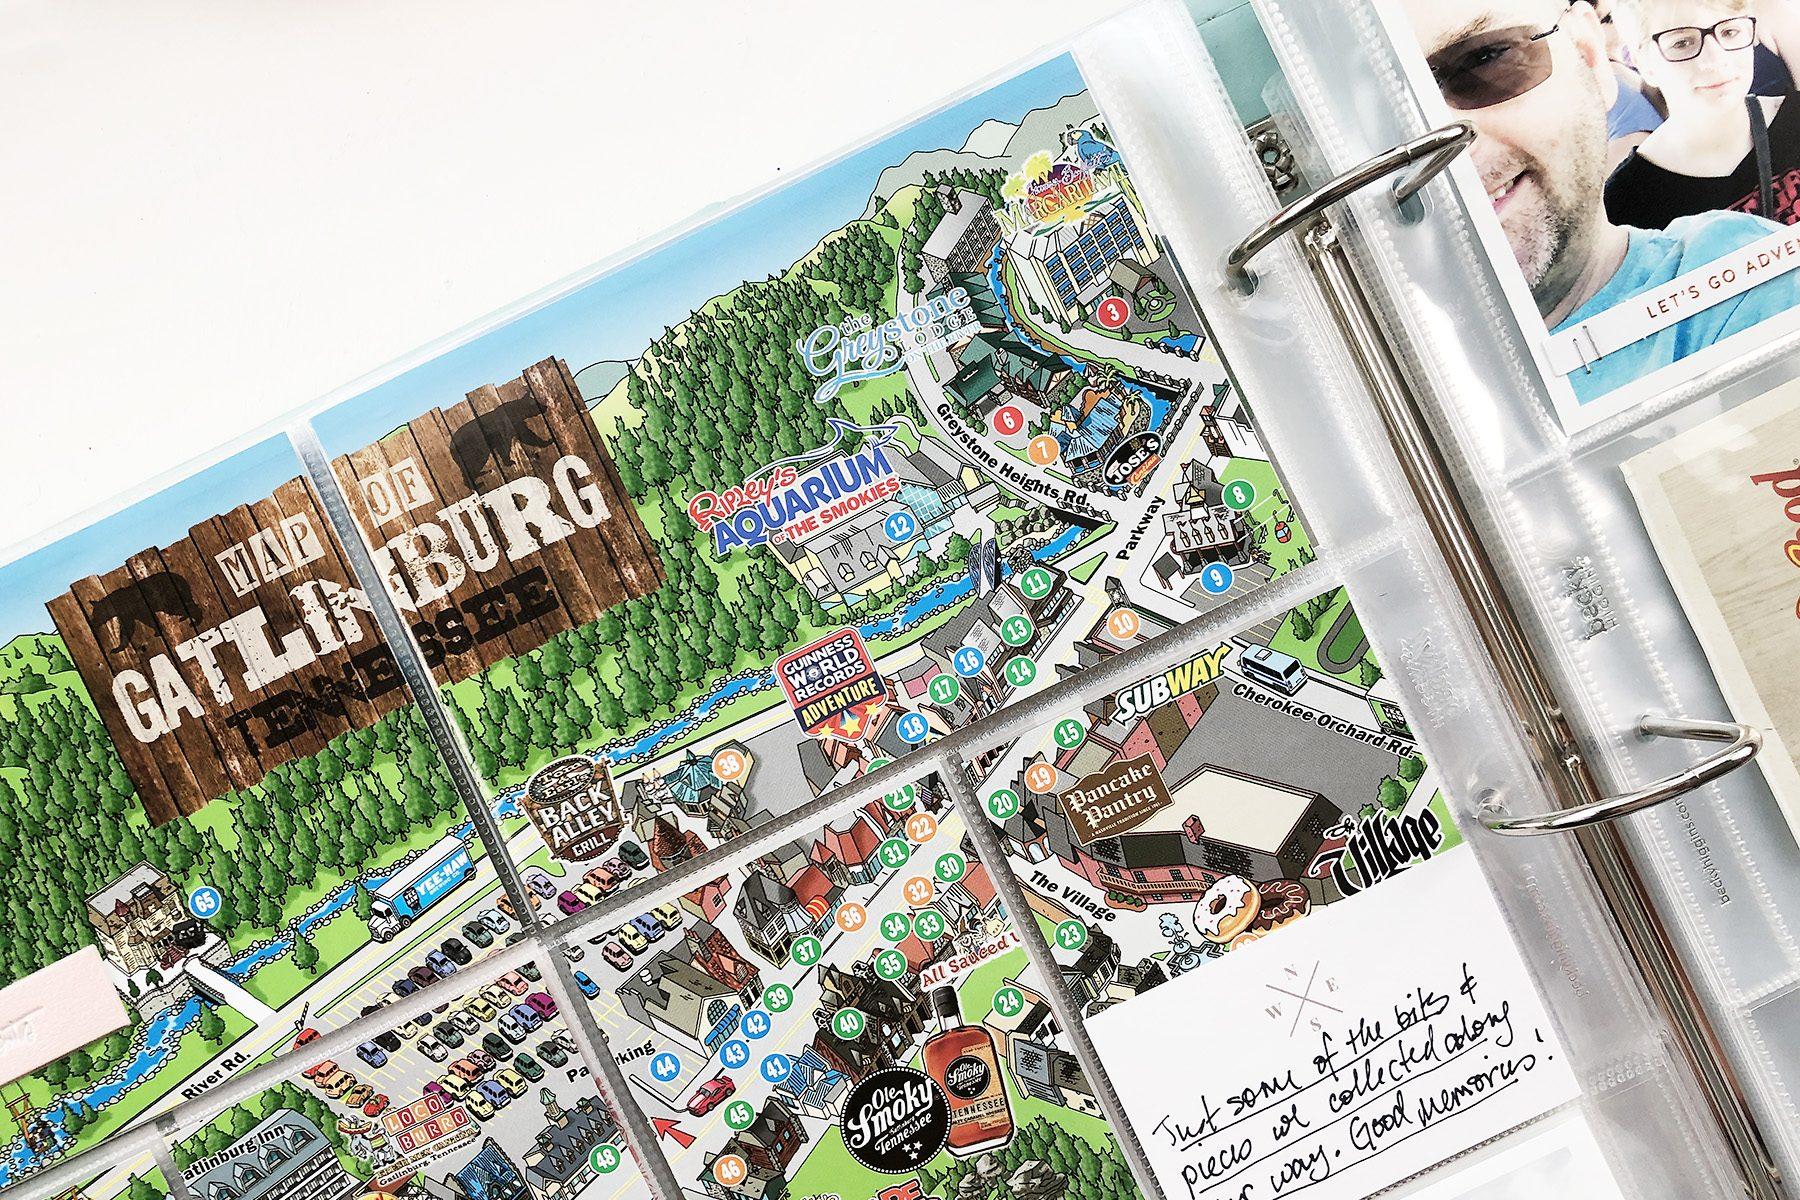 Larkindesign Including Ephemera In Project Life | Gatlinburg 2019 Part 04!!!